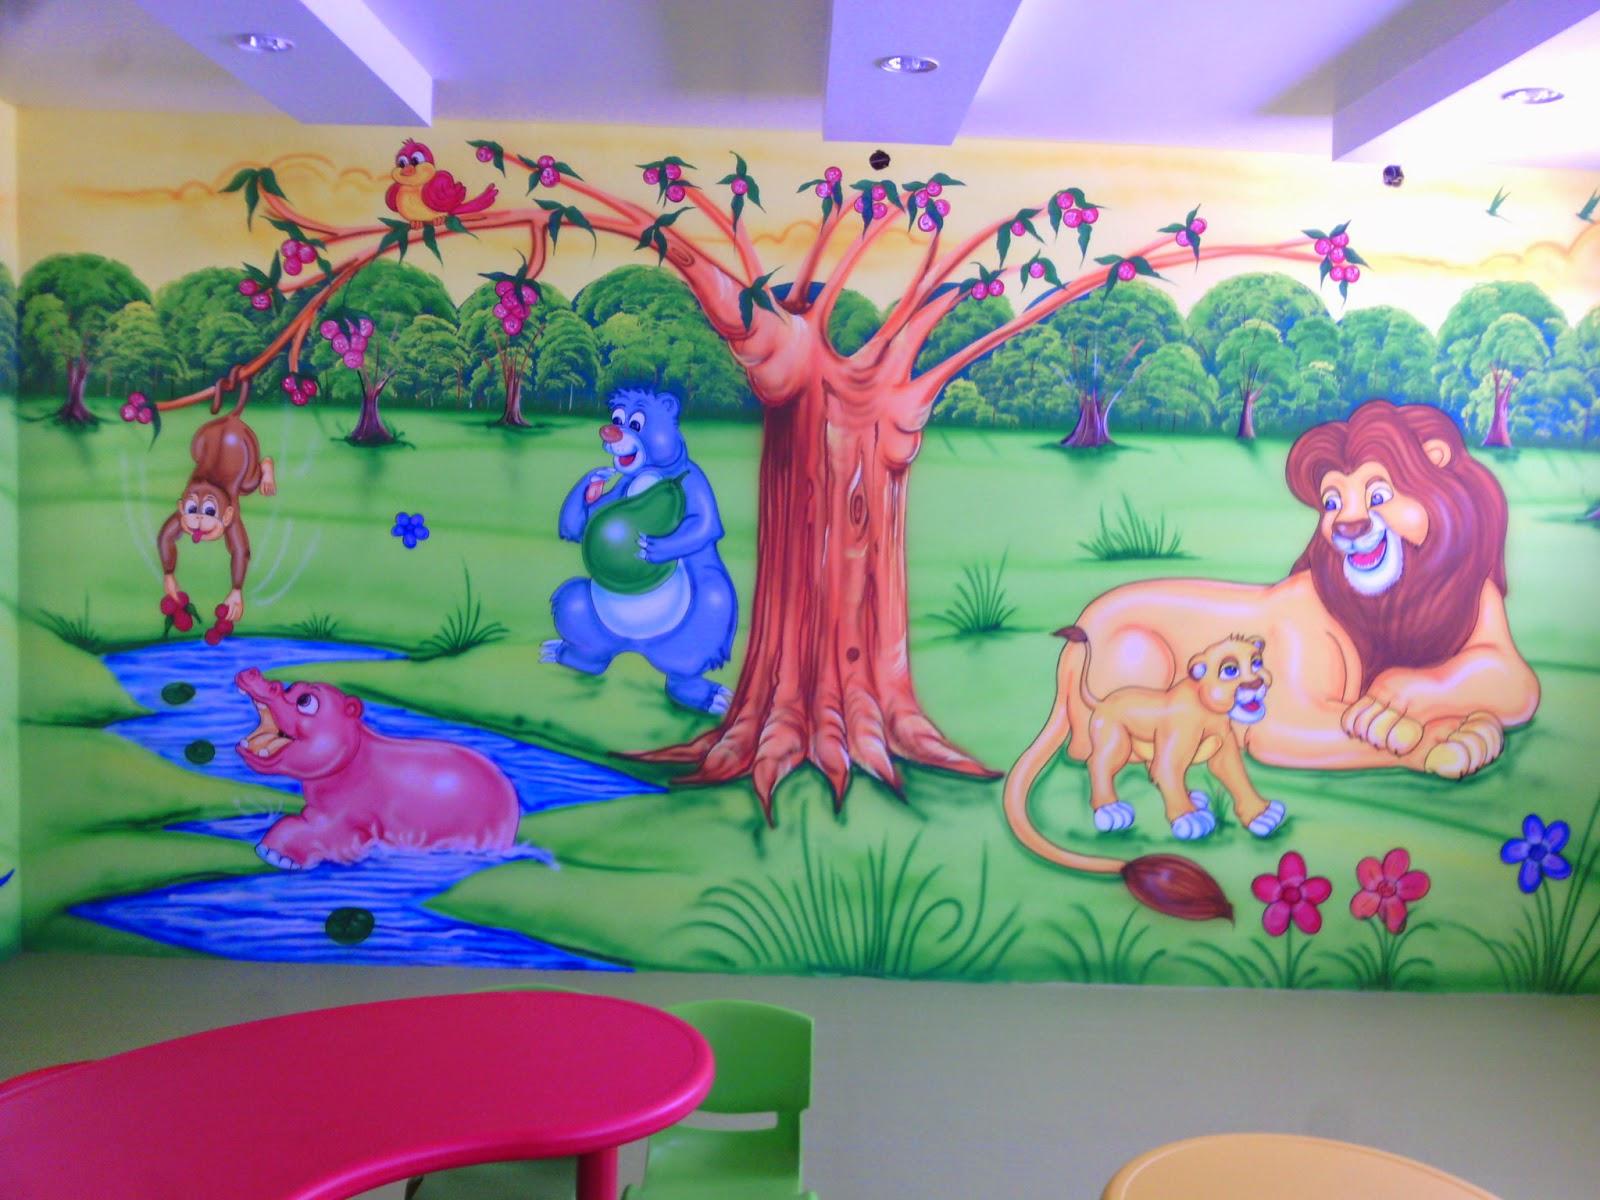 play school wall painting cartoon painting kids room painting. Black Bedroom Furniture Sets. Home Design Ideas